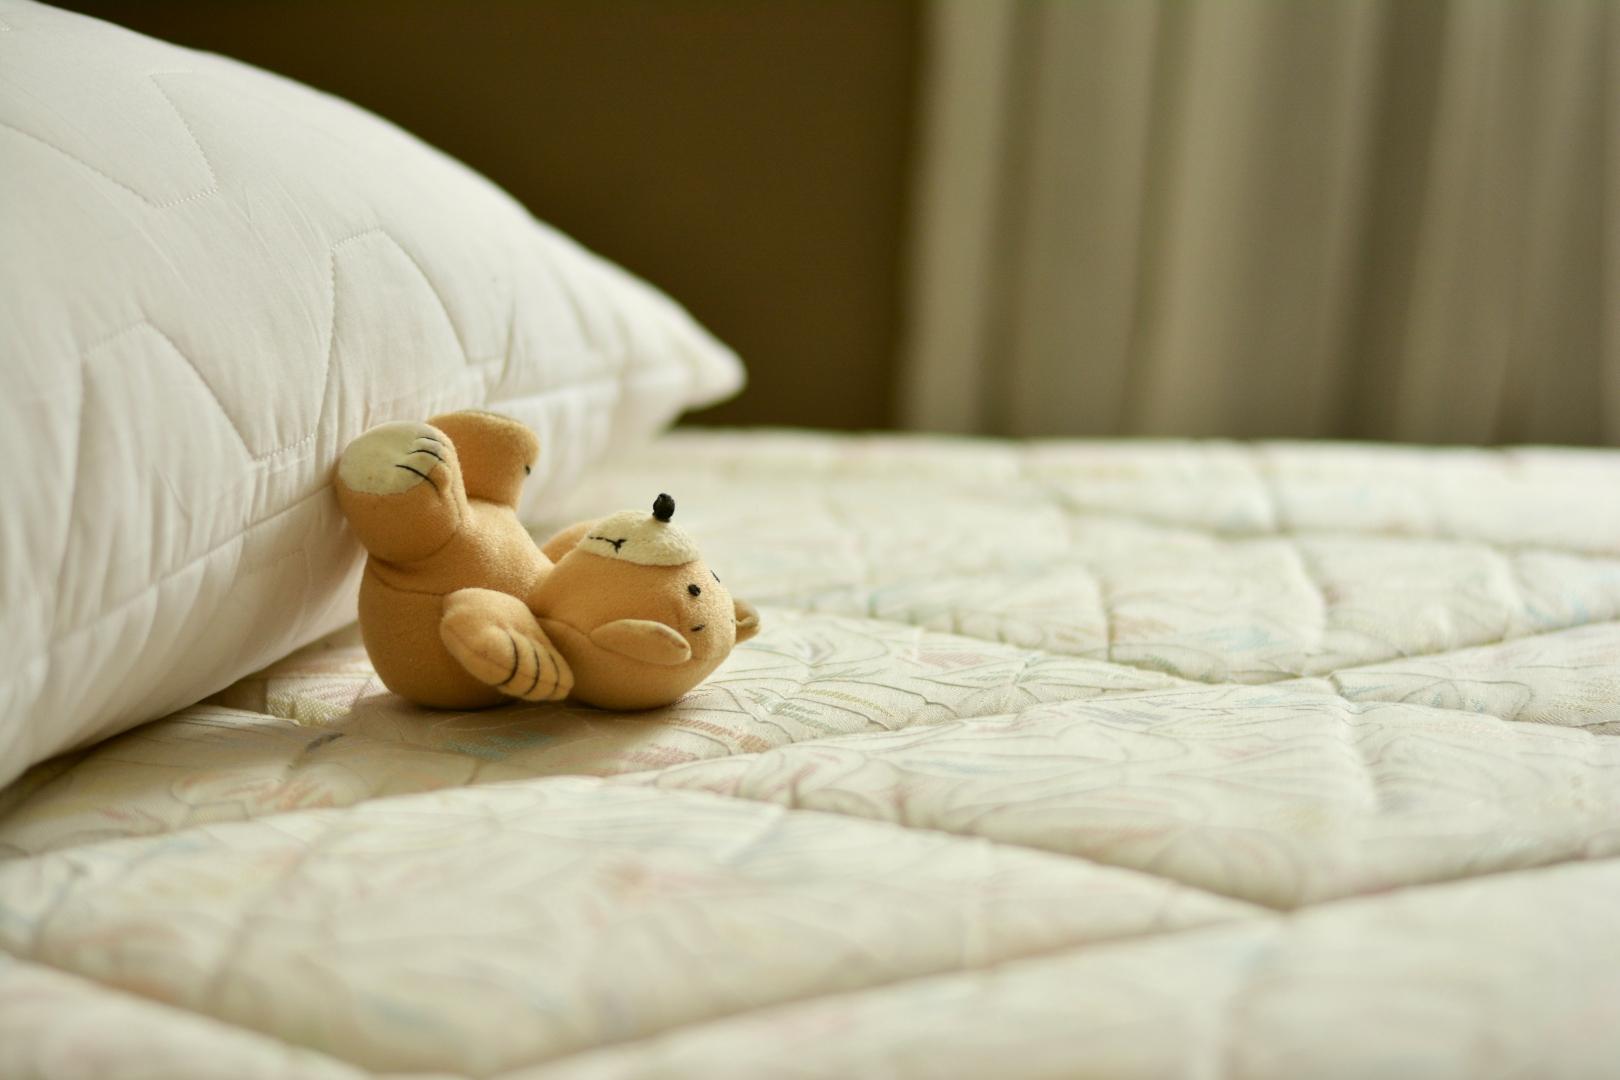 Медвеженок на кровати